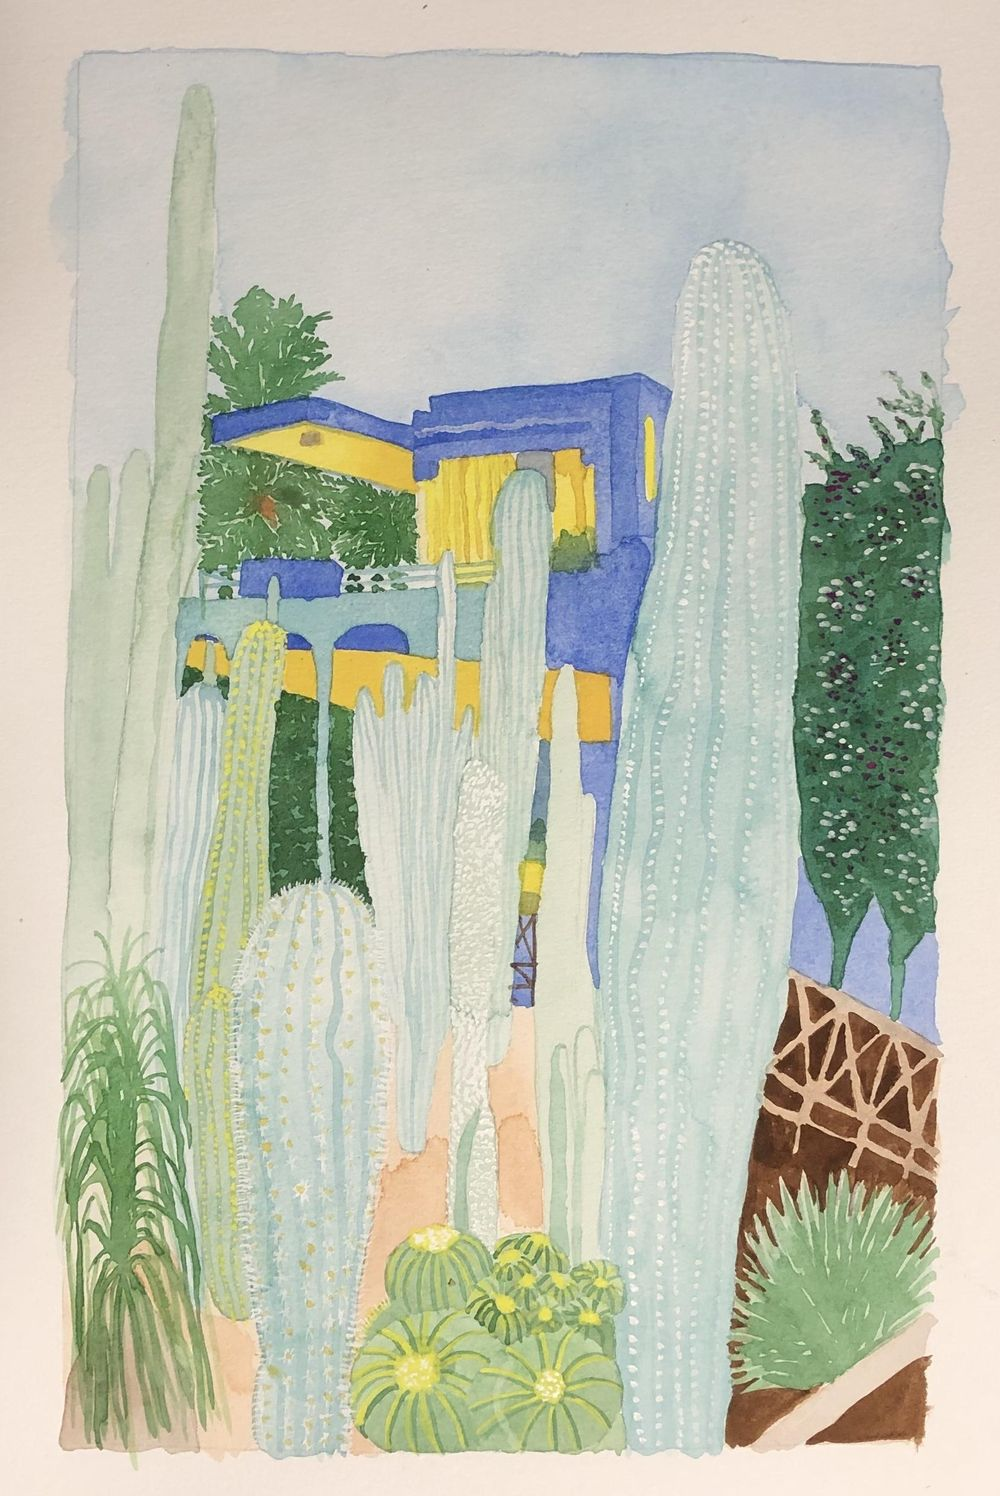 Majorelle Garden - image 1 - student project